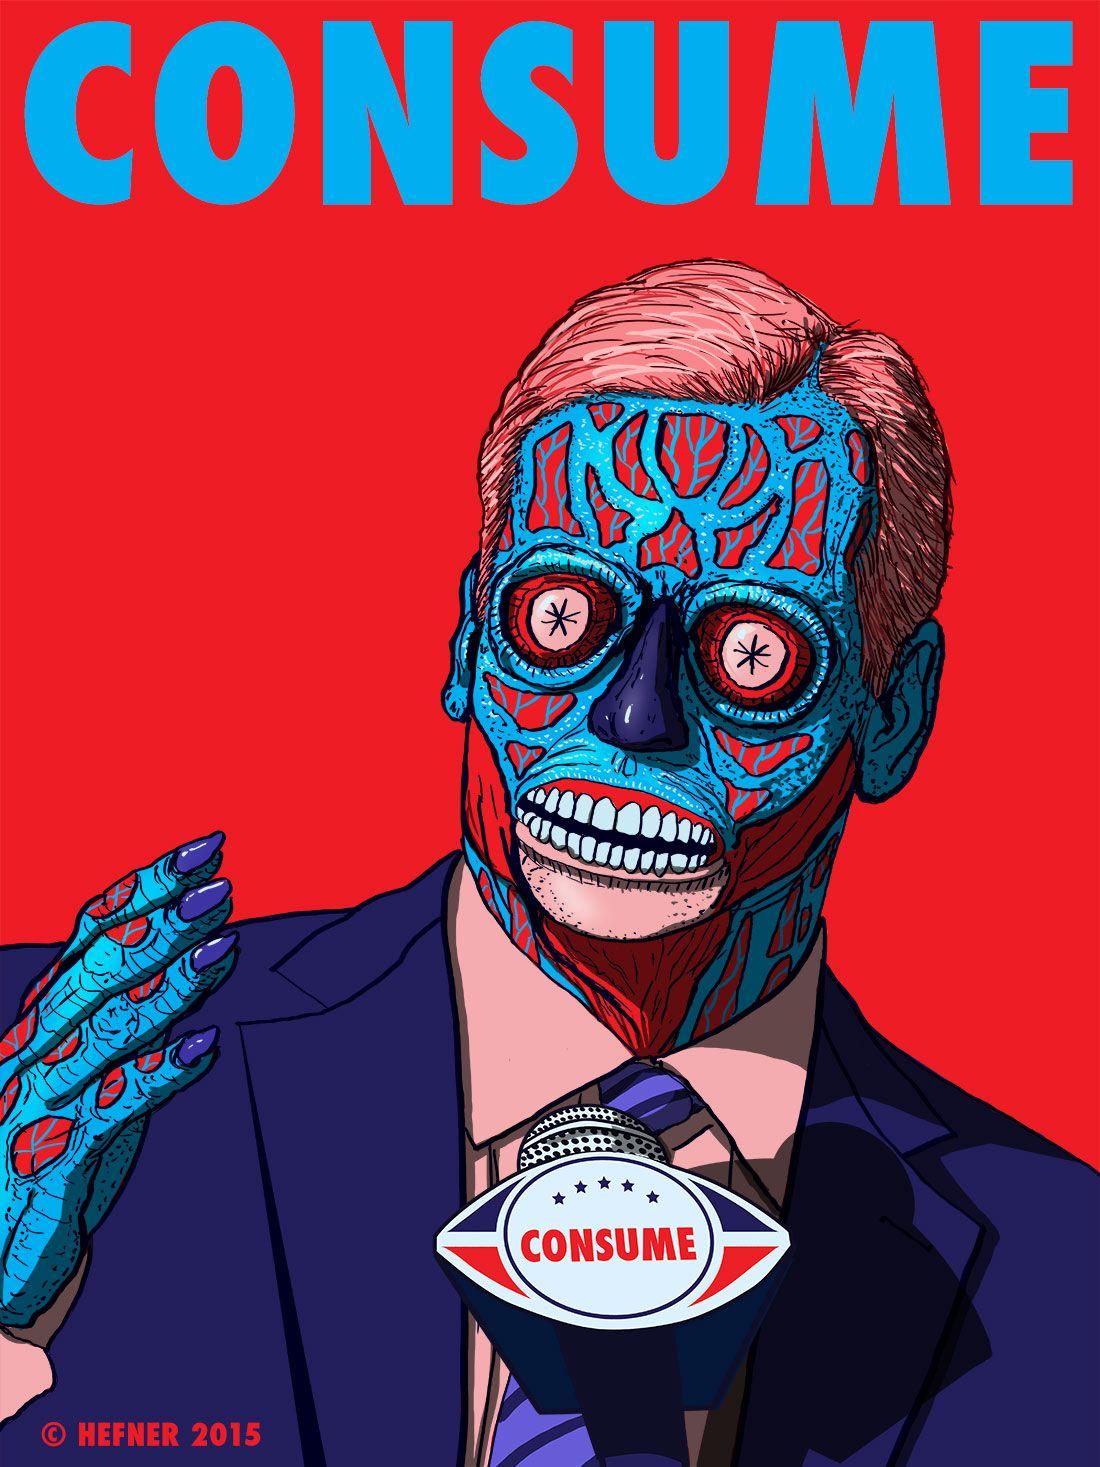 Consume   Psychedelic art, Horror artwork, Horror art